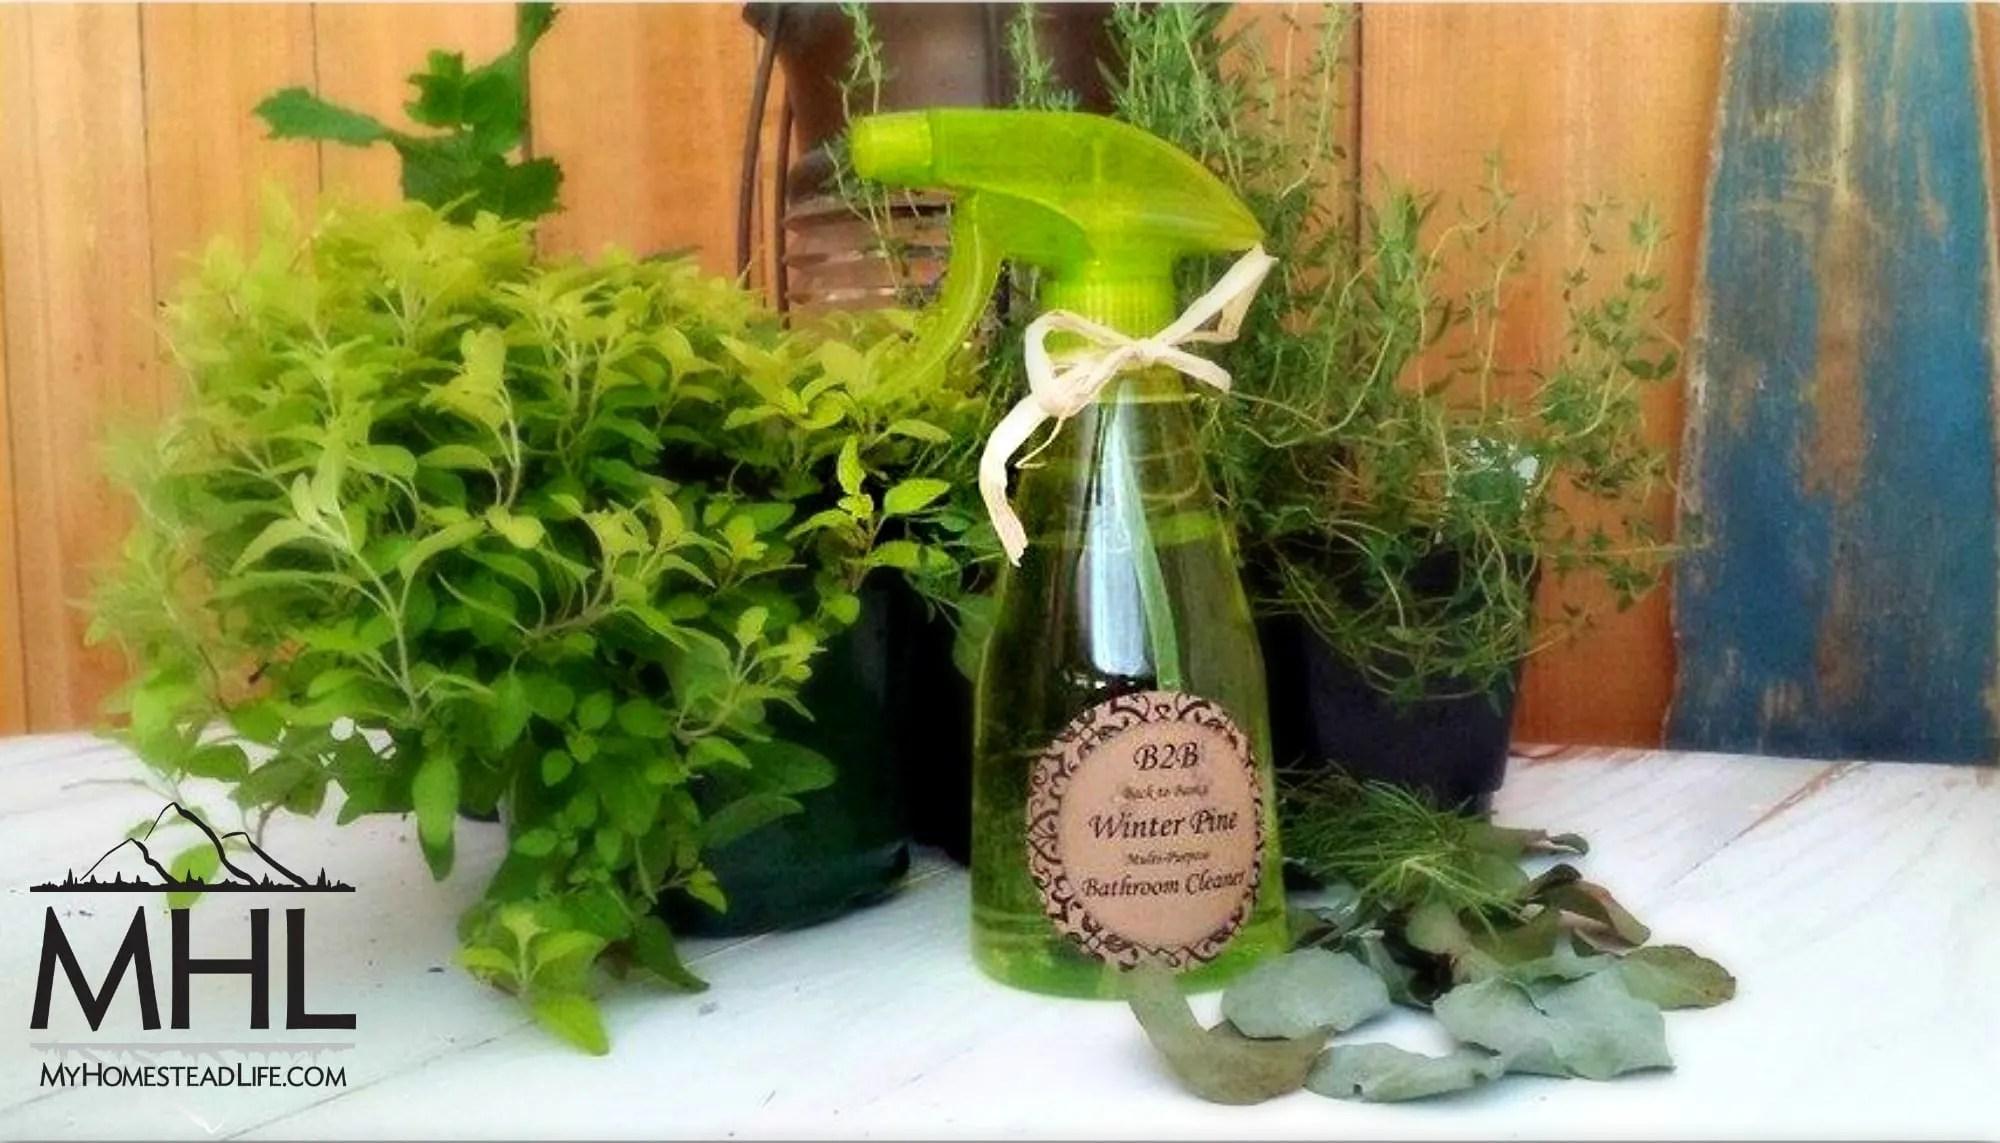 herbal cleaner MHL